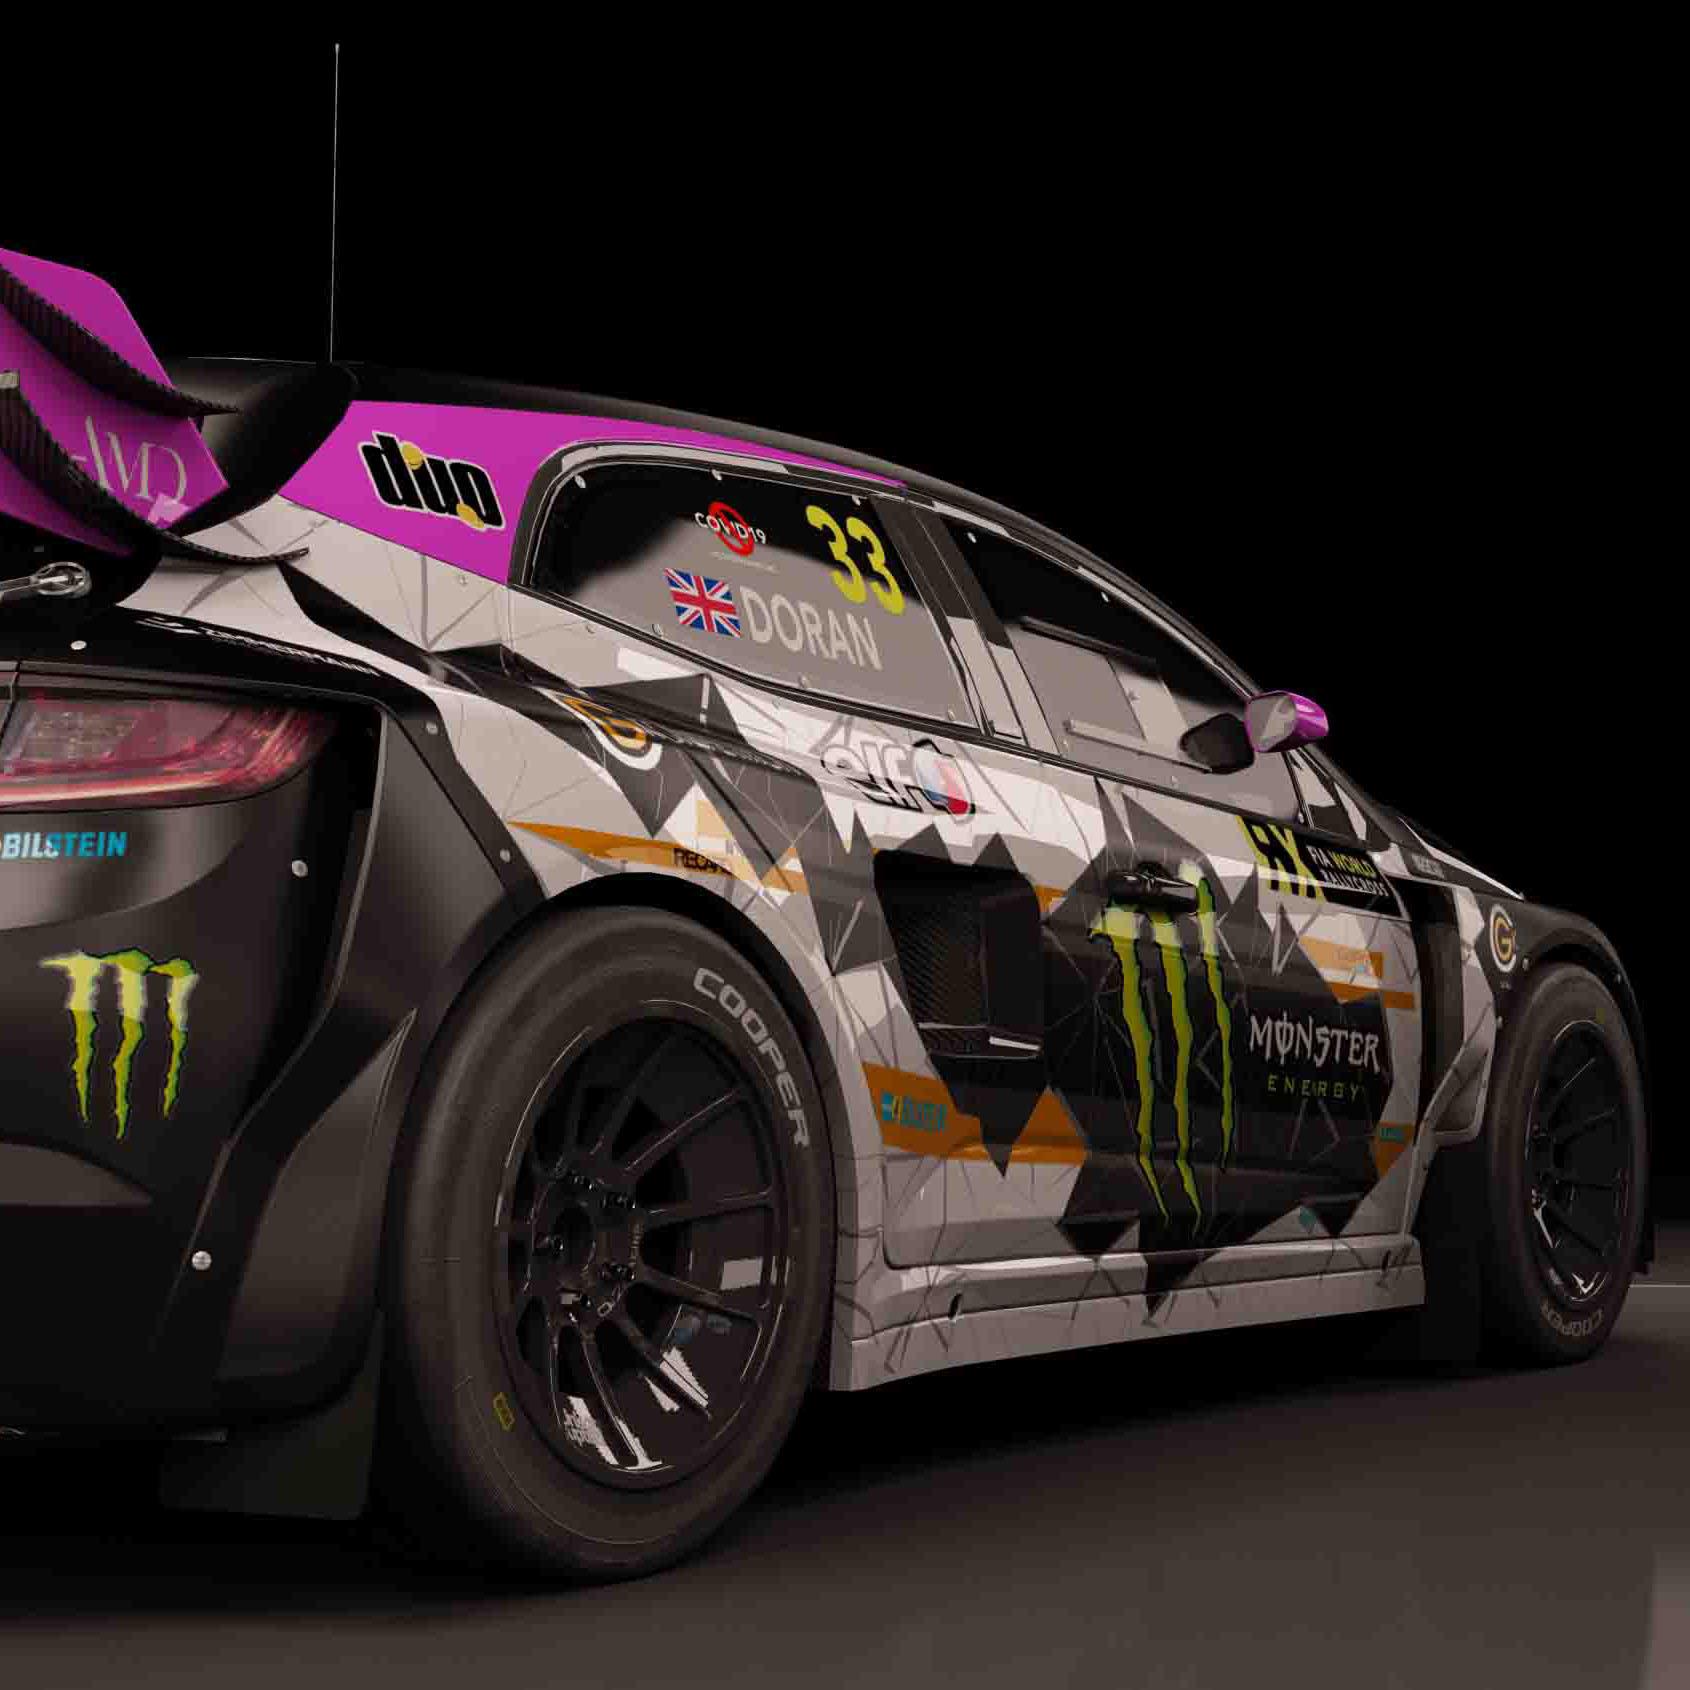 Renault Megane FIA World Rallycross AMD 03 a